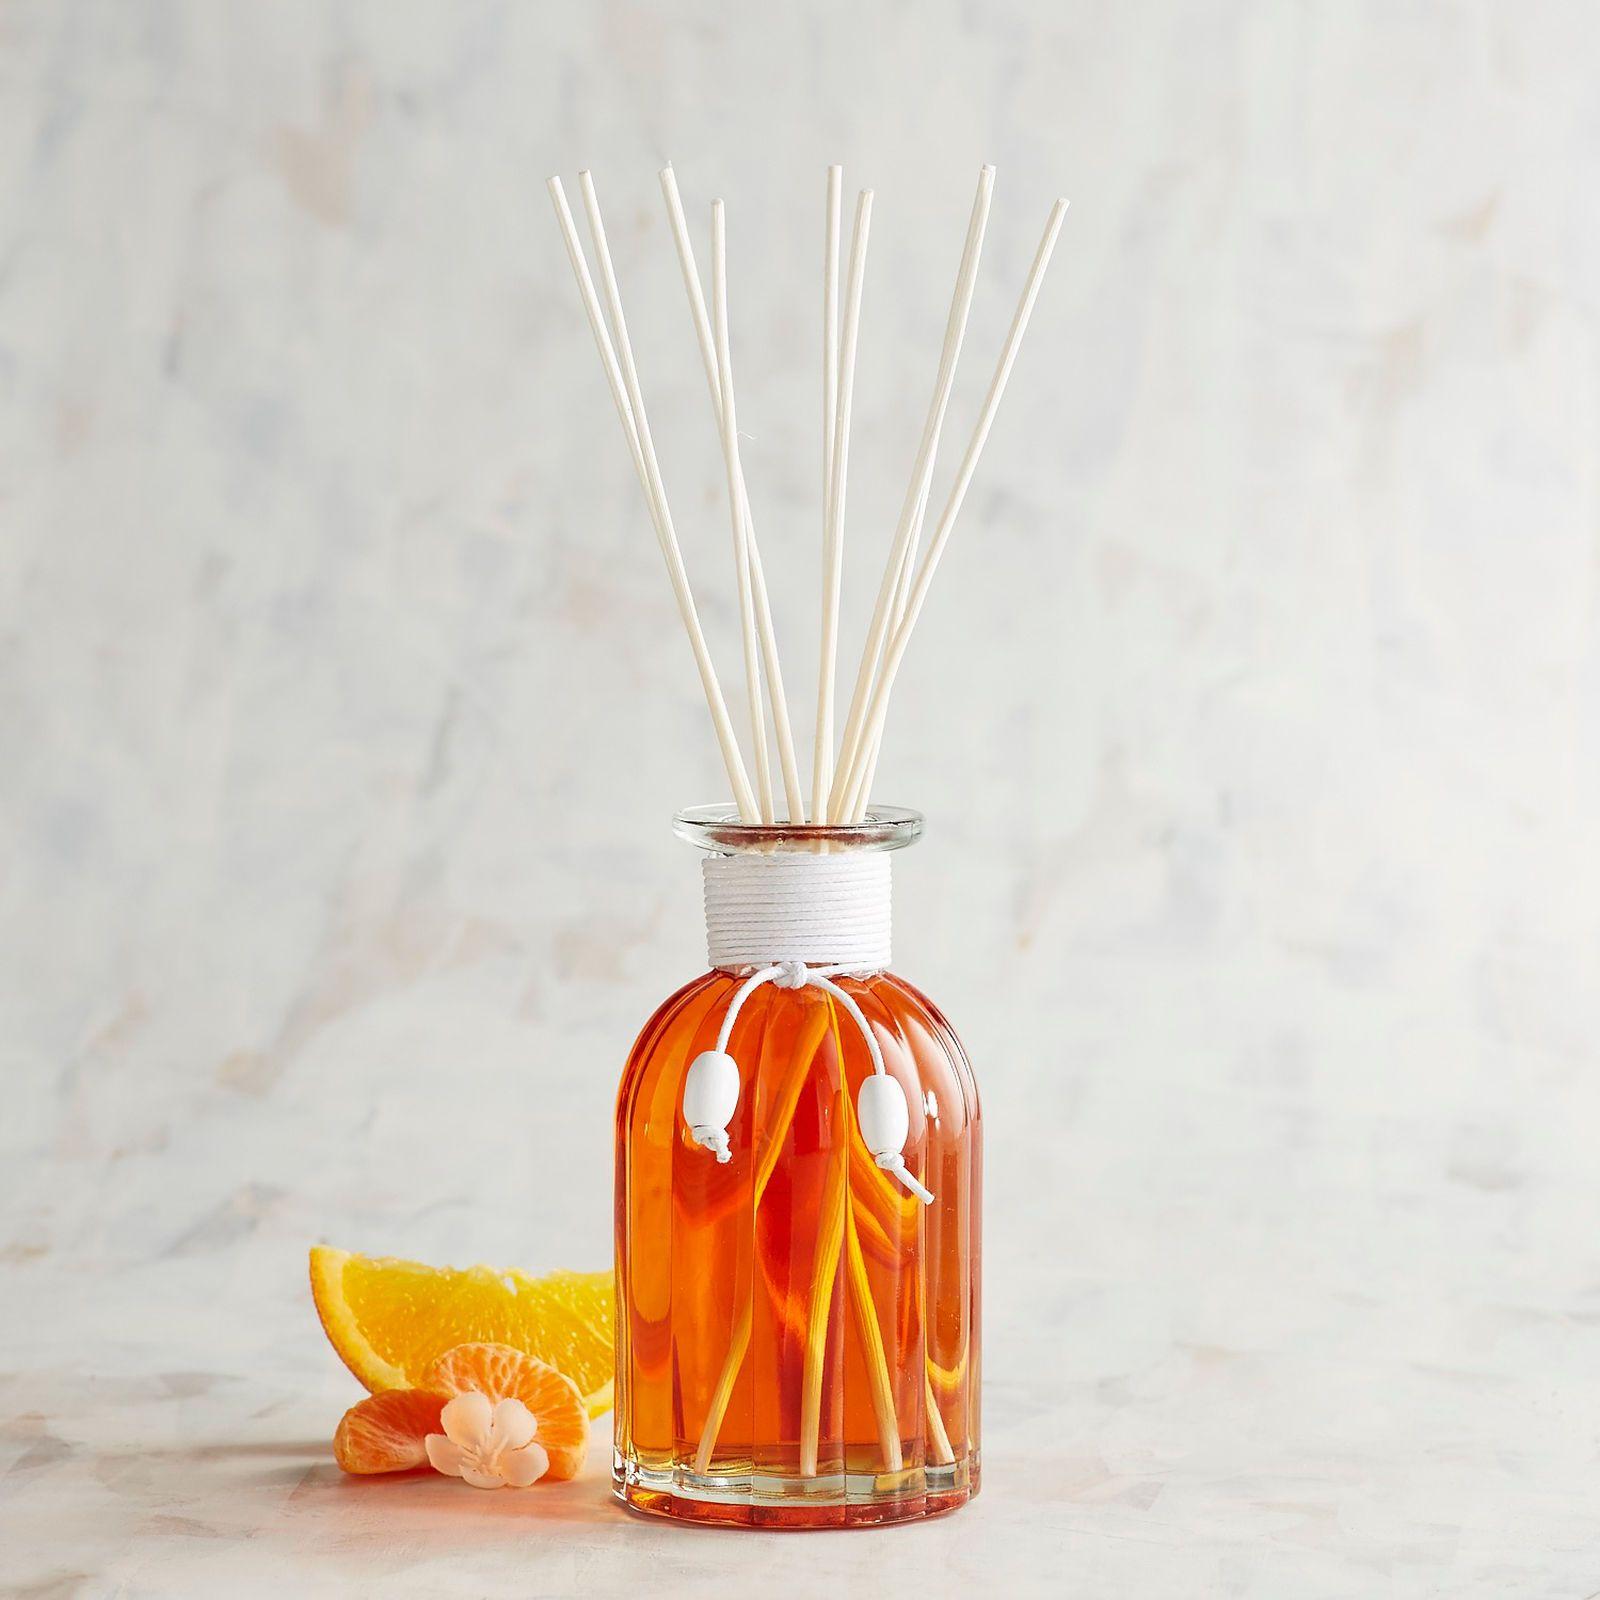 A bright fruitfilled scent that blends grapefruit